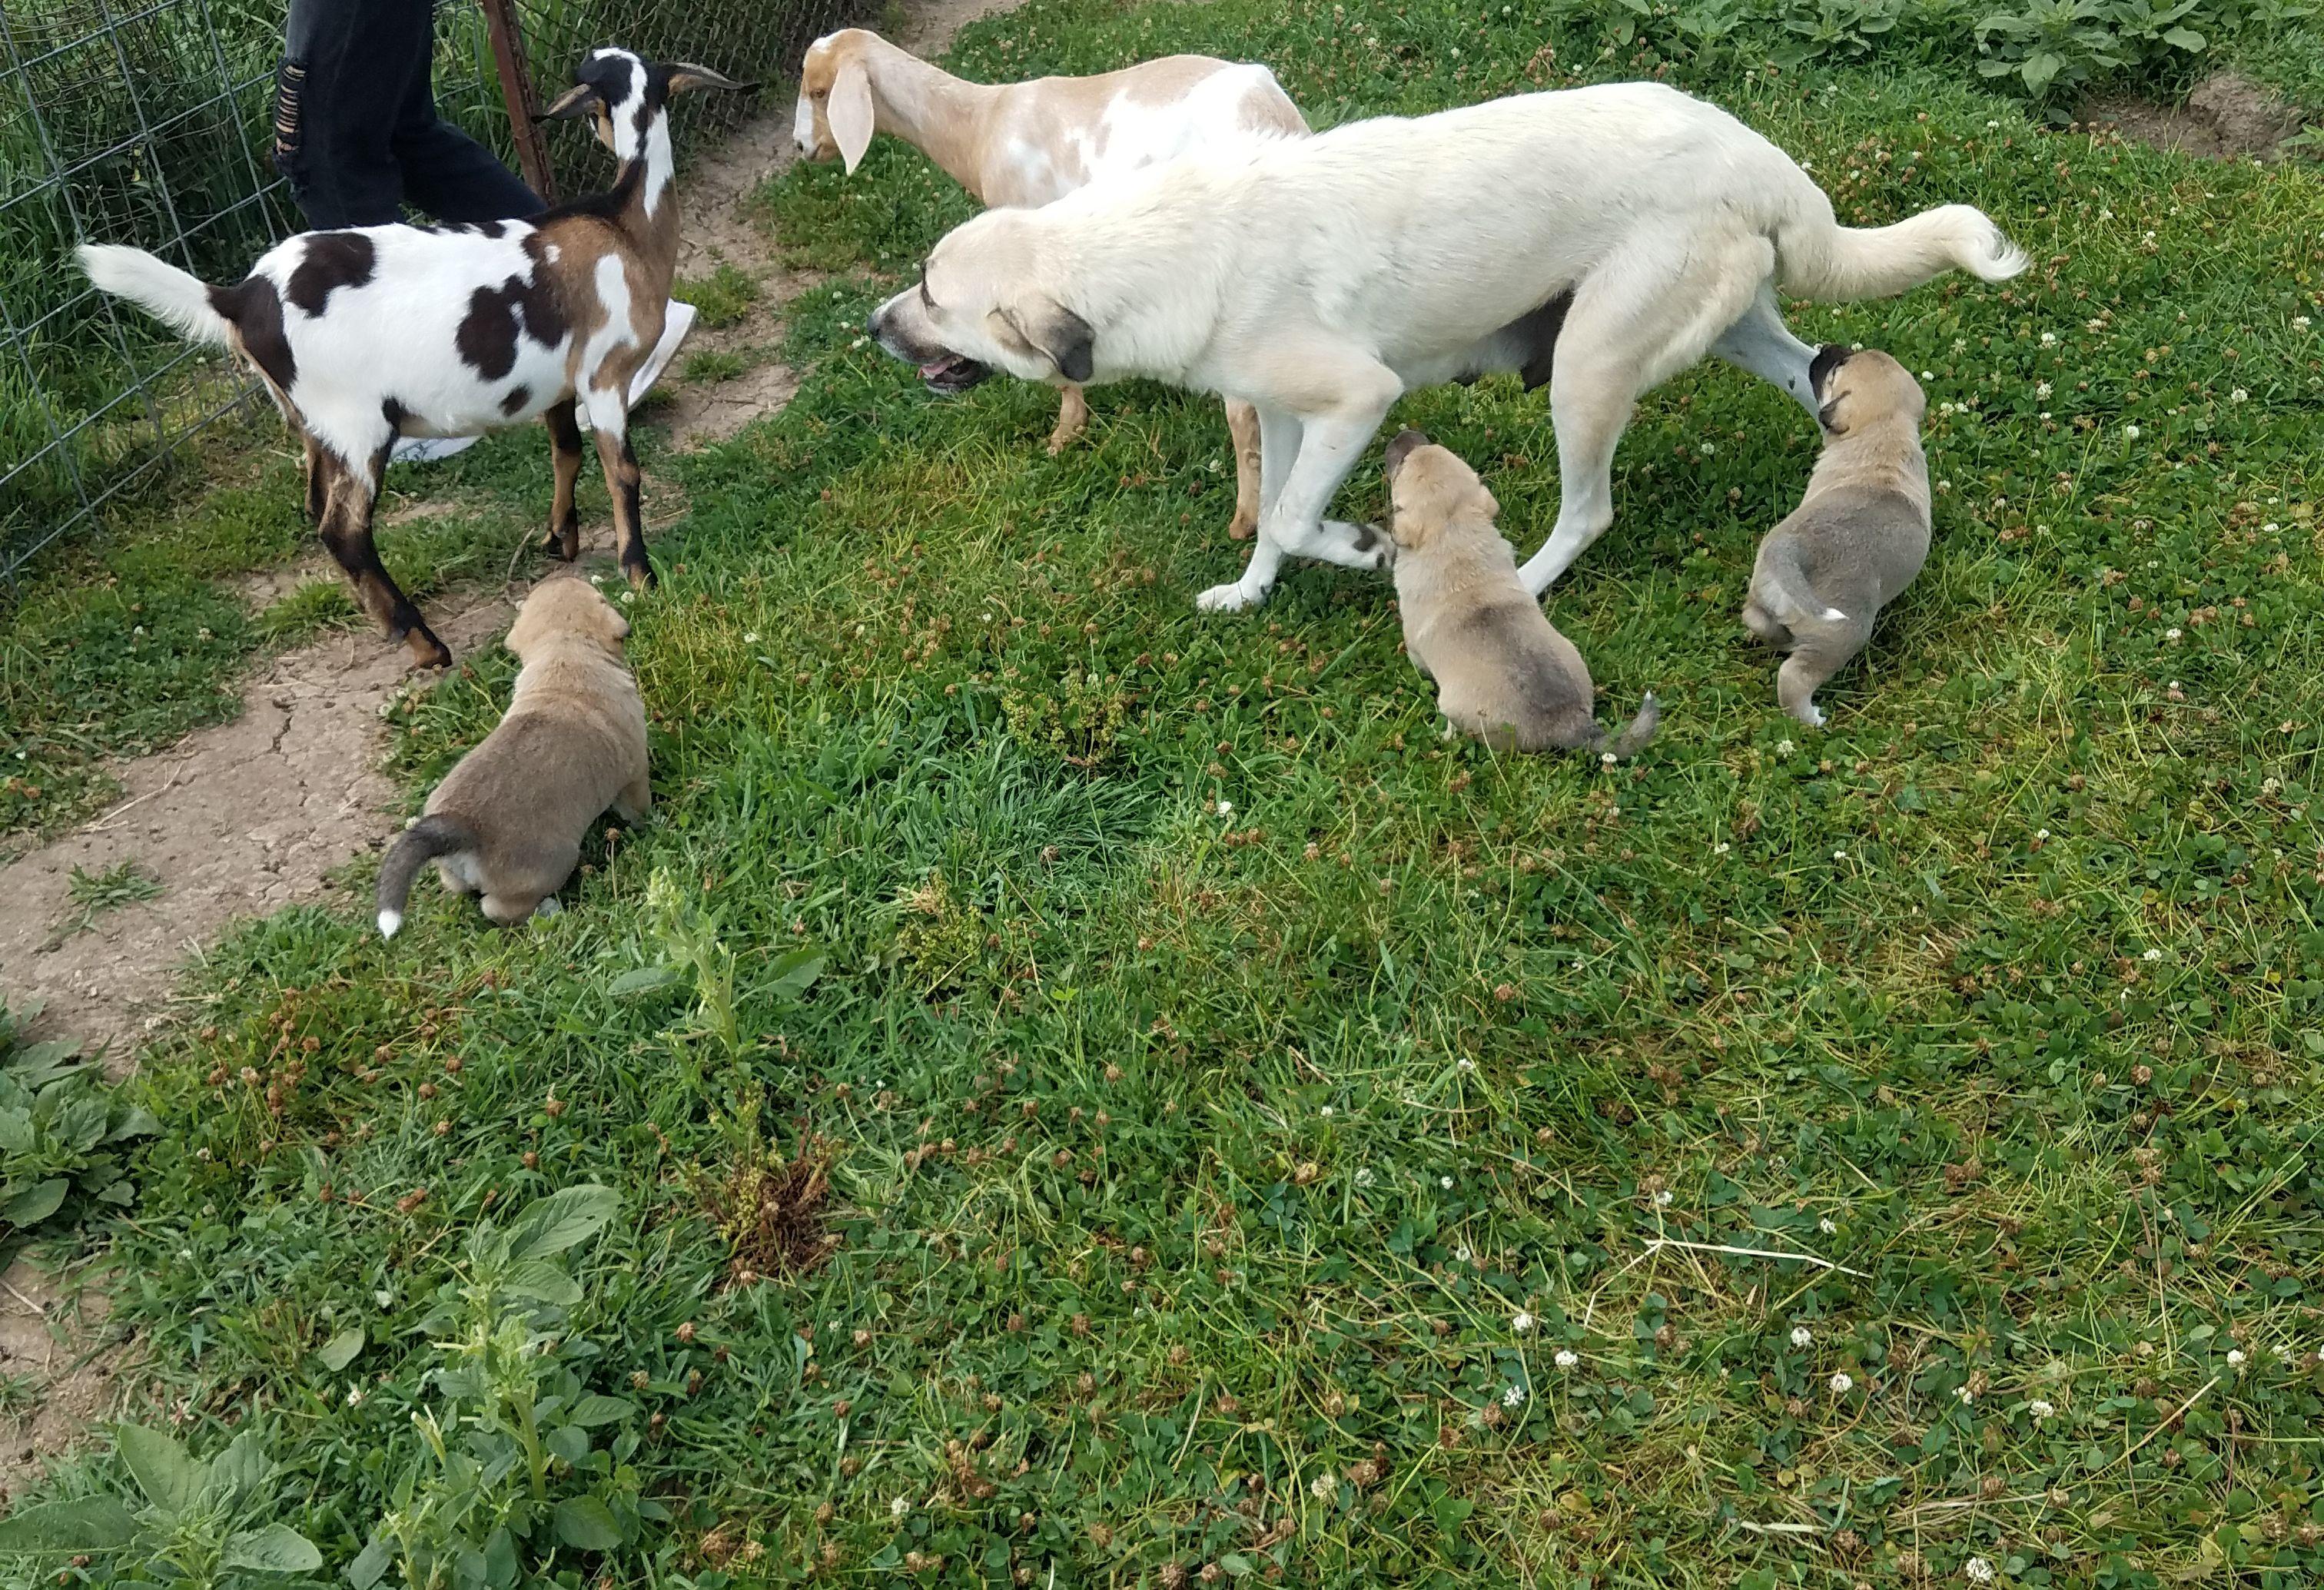 Anatolian Shepherd puppies image 1